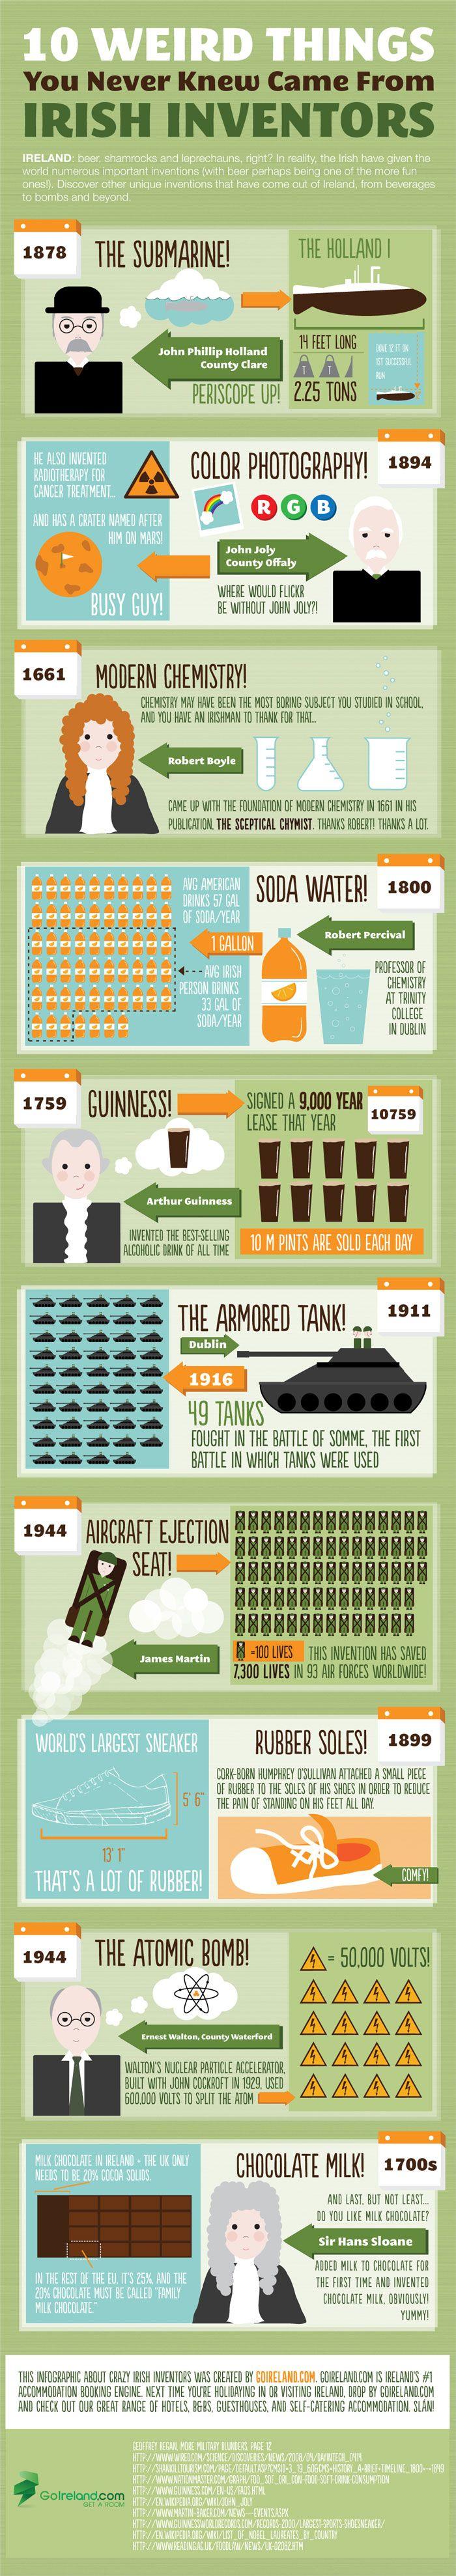 10 Irish Inventions that Changed the World